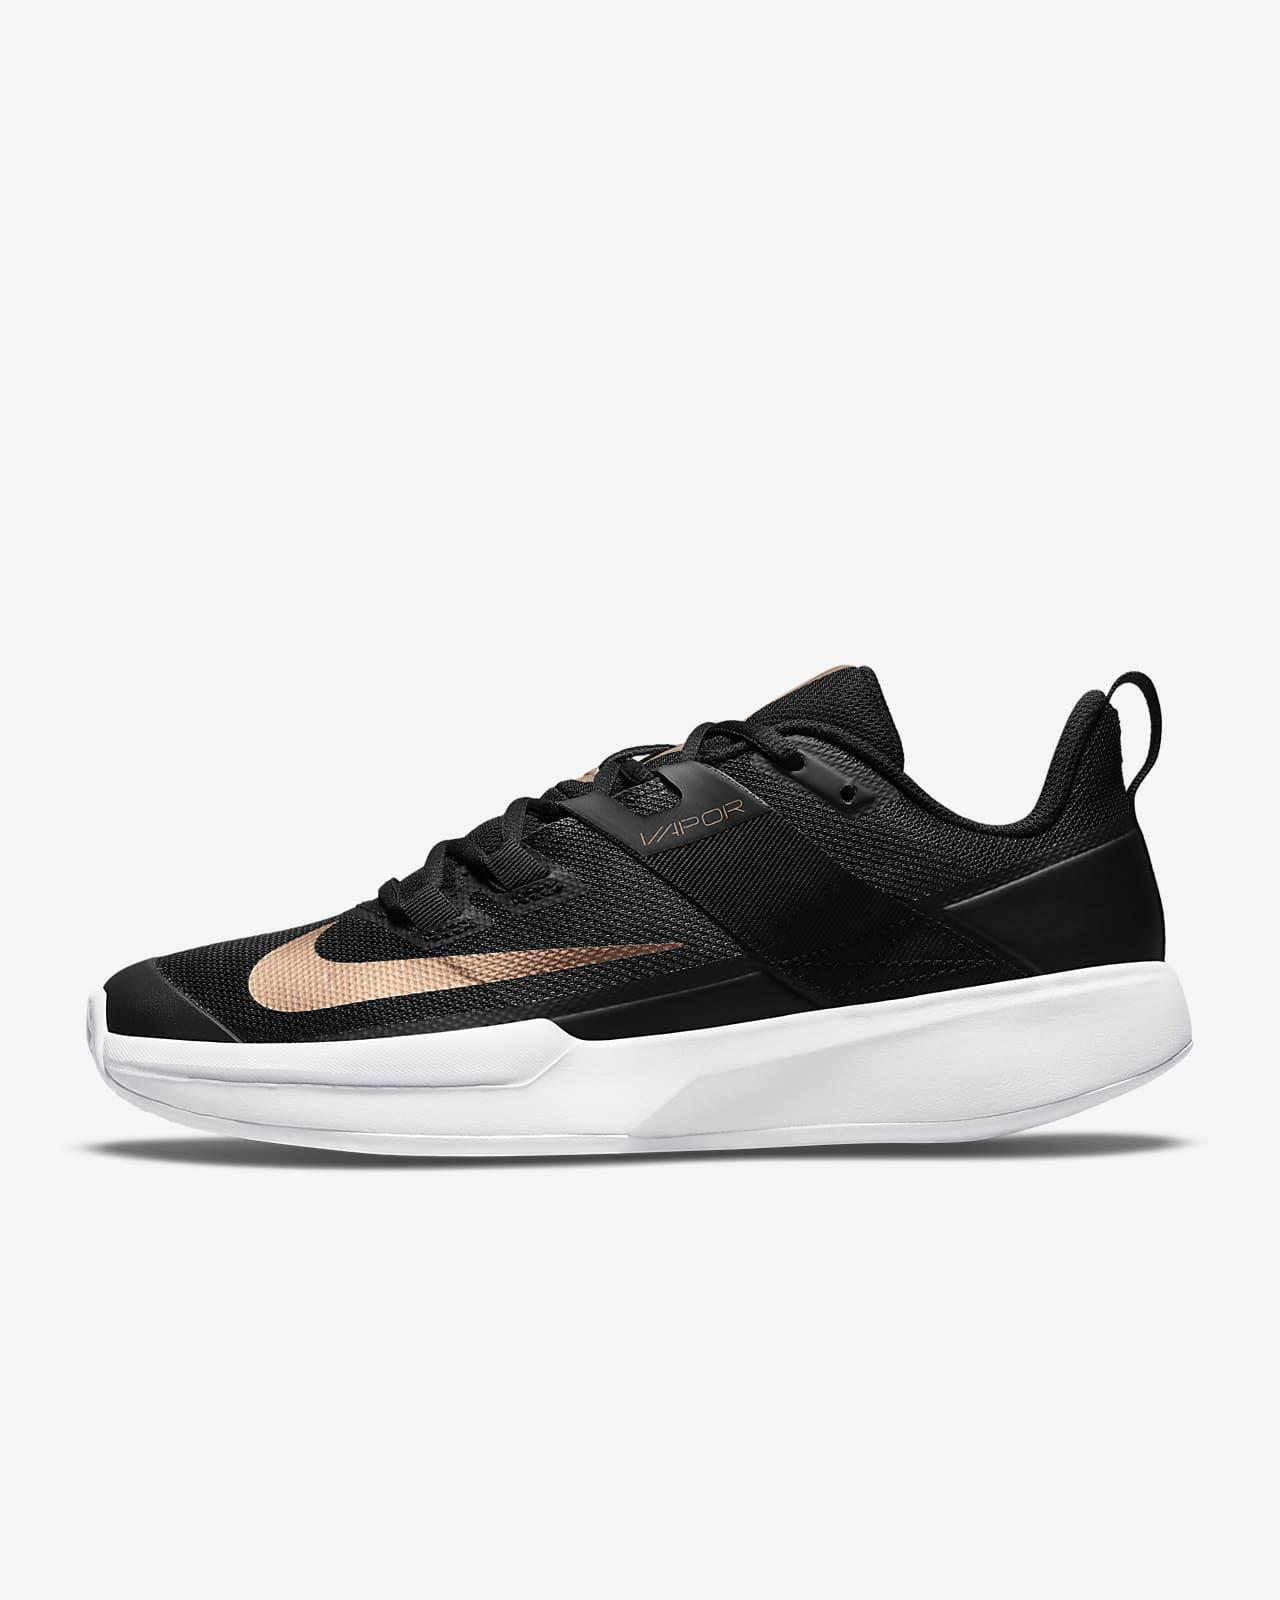 Calzado de tenis de cancha de arcilla para mujer NikeCourt Vapor Lite